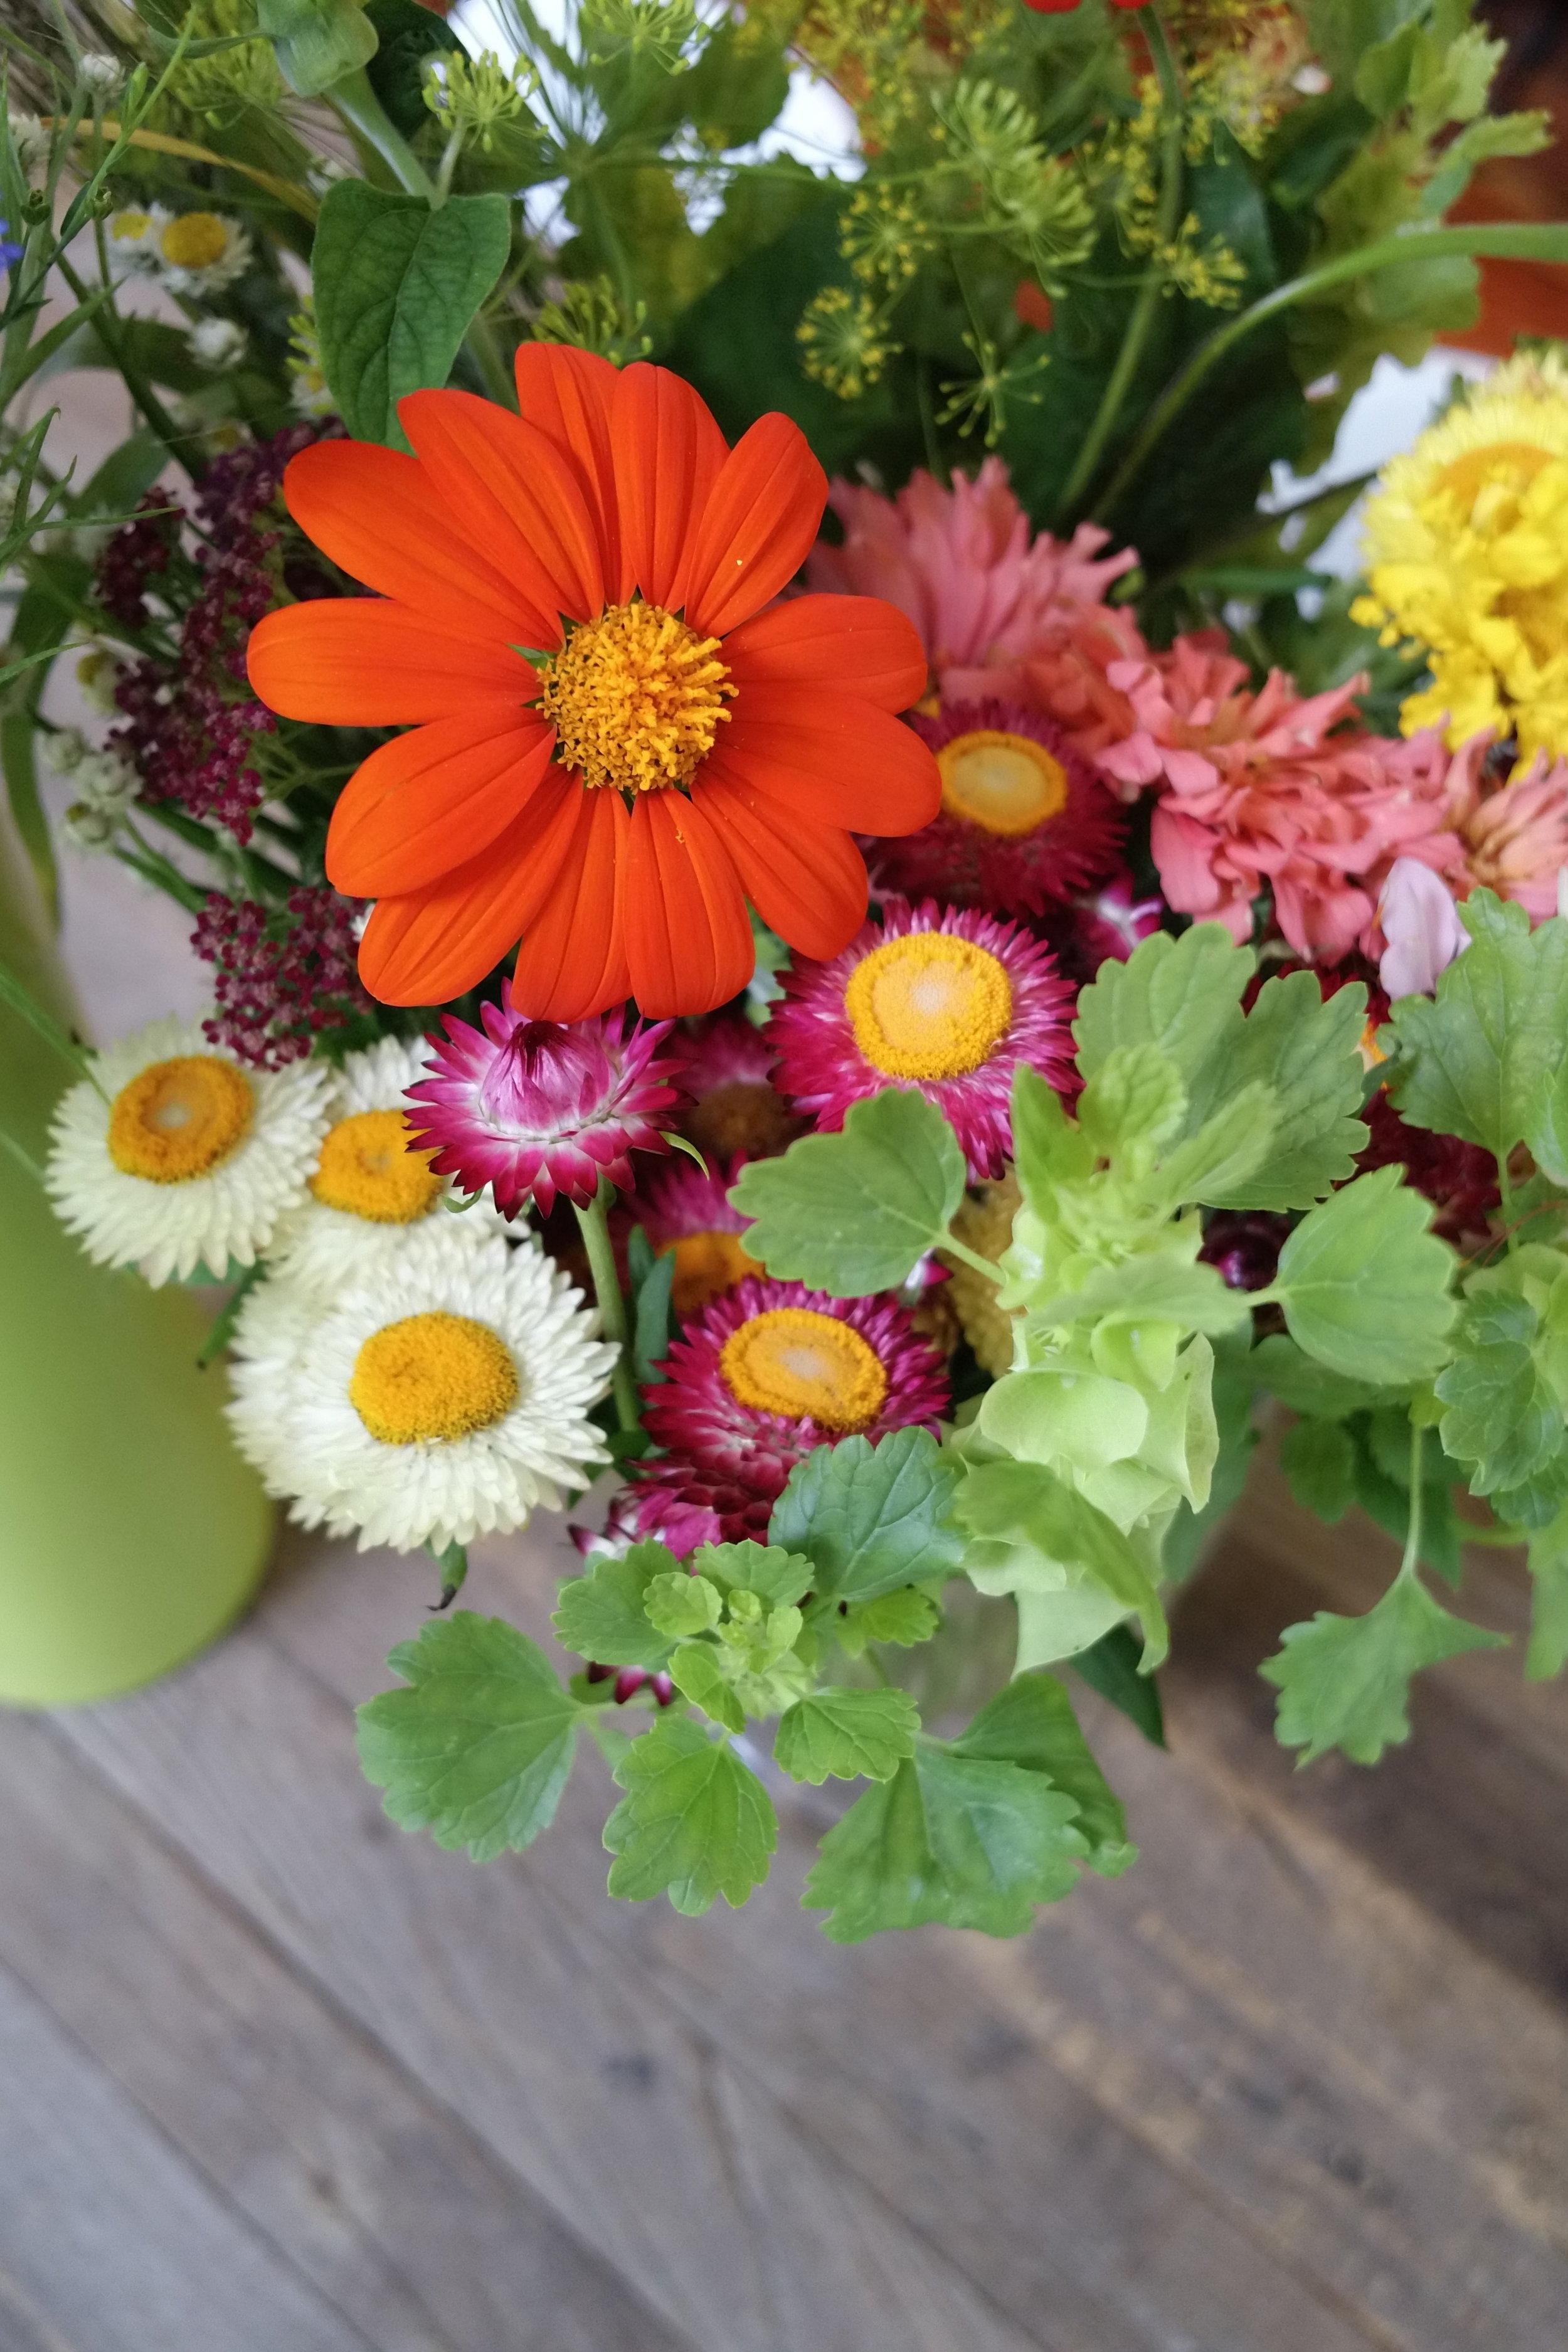 Tithonia & Strawflowers